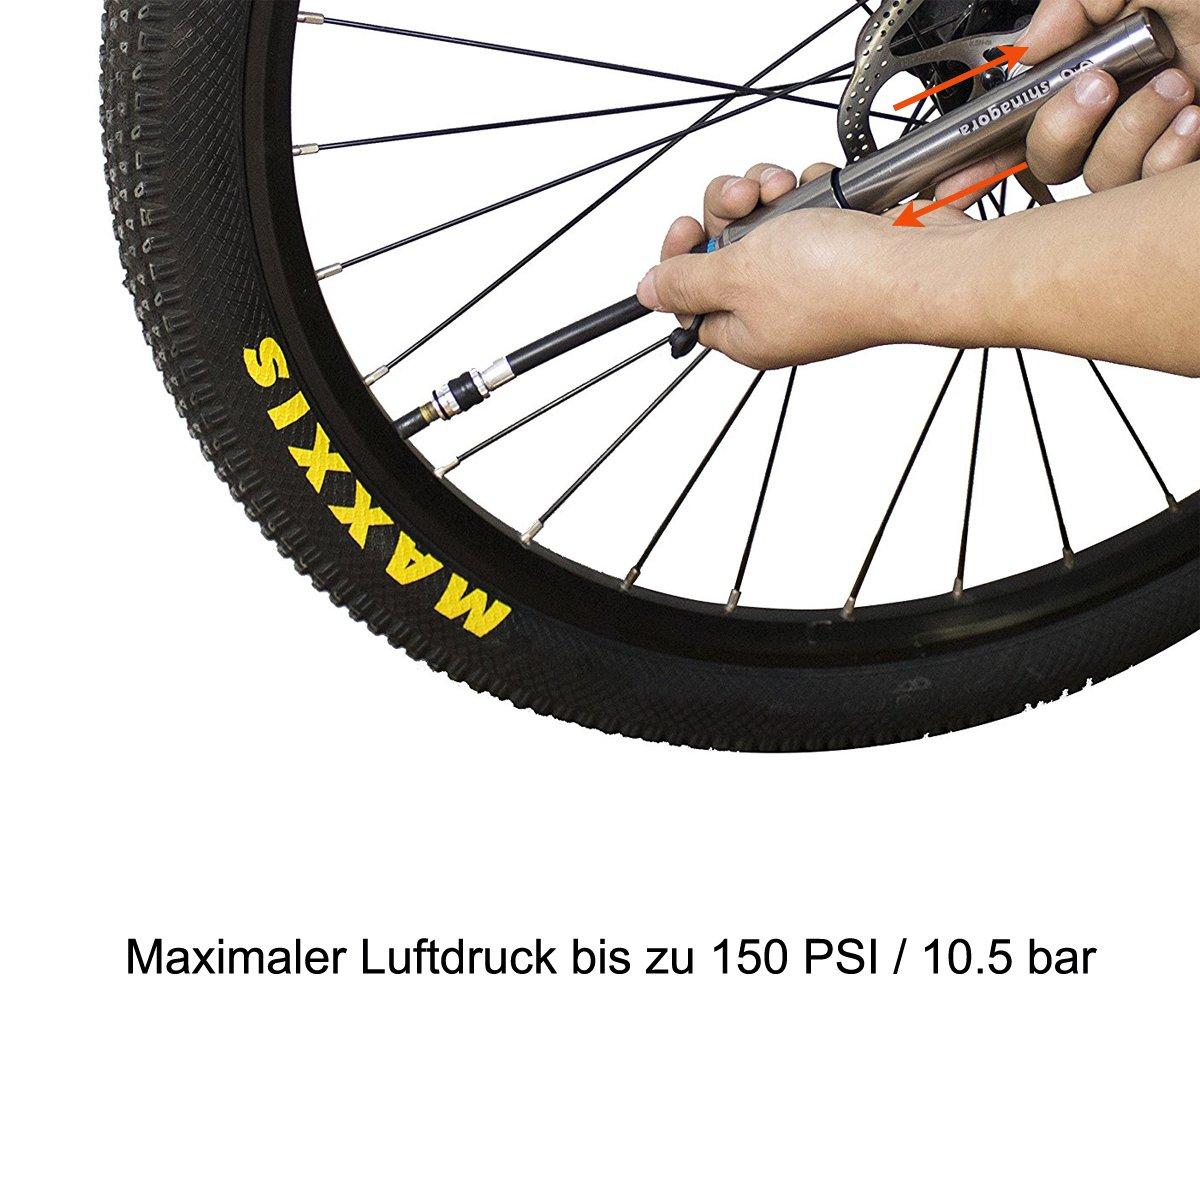 Shinagora Mini Fahrrad Pumpe, Rahmenpumpe Tragbar Kompatibel mit ...